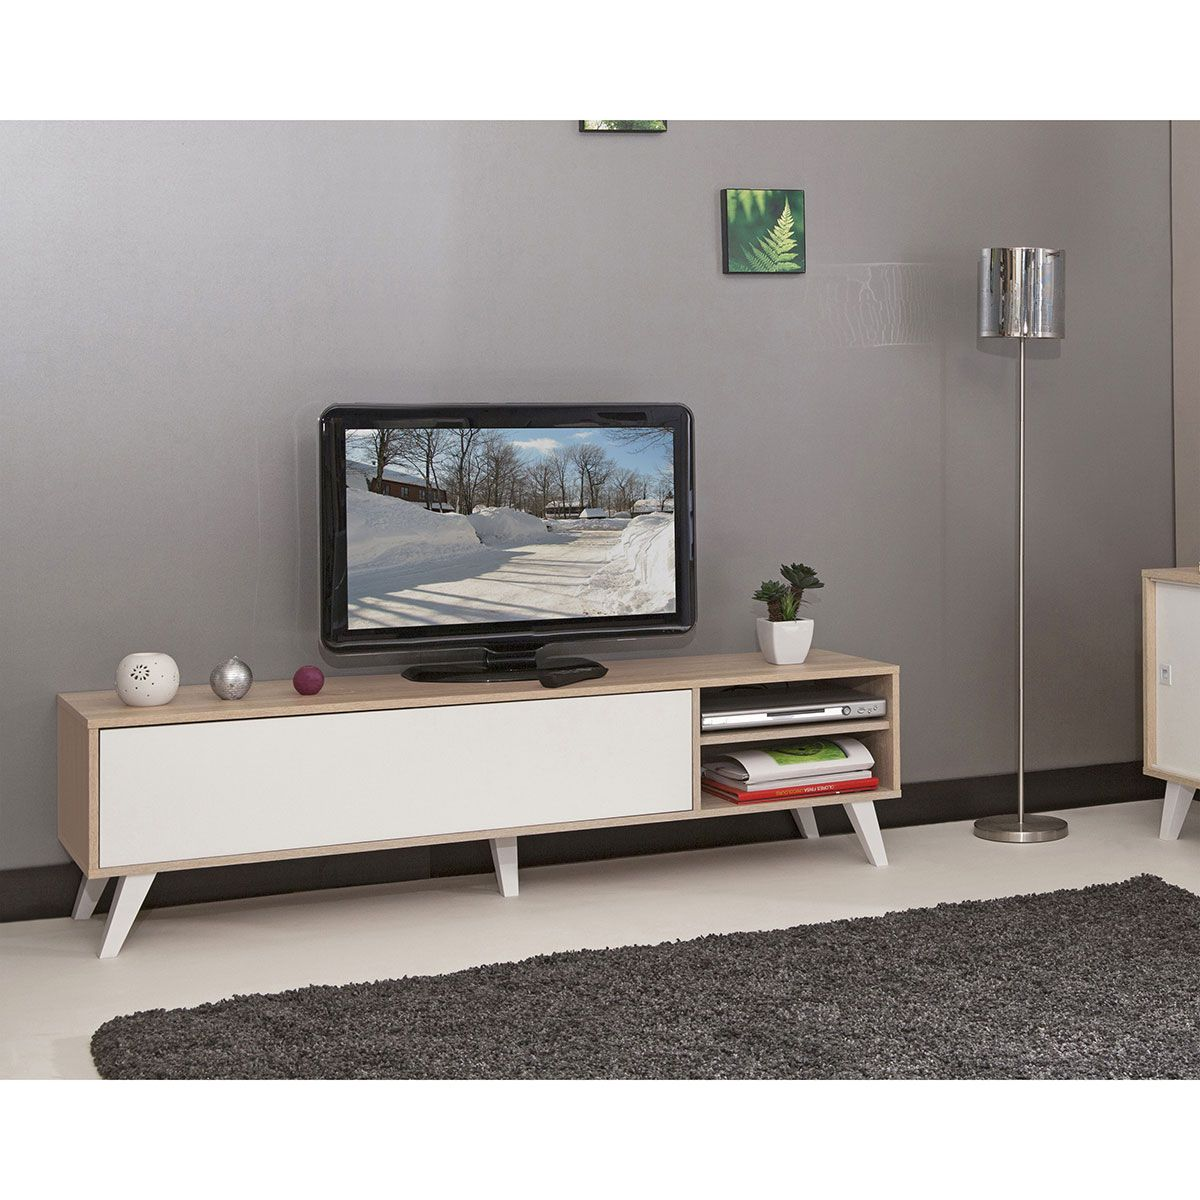 Meuble Tv Pieds Inclin S 165 Cm Ch Ne Blanc Chene Blanc Meuble  # Meuble Tv Pied Bois